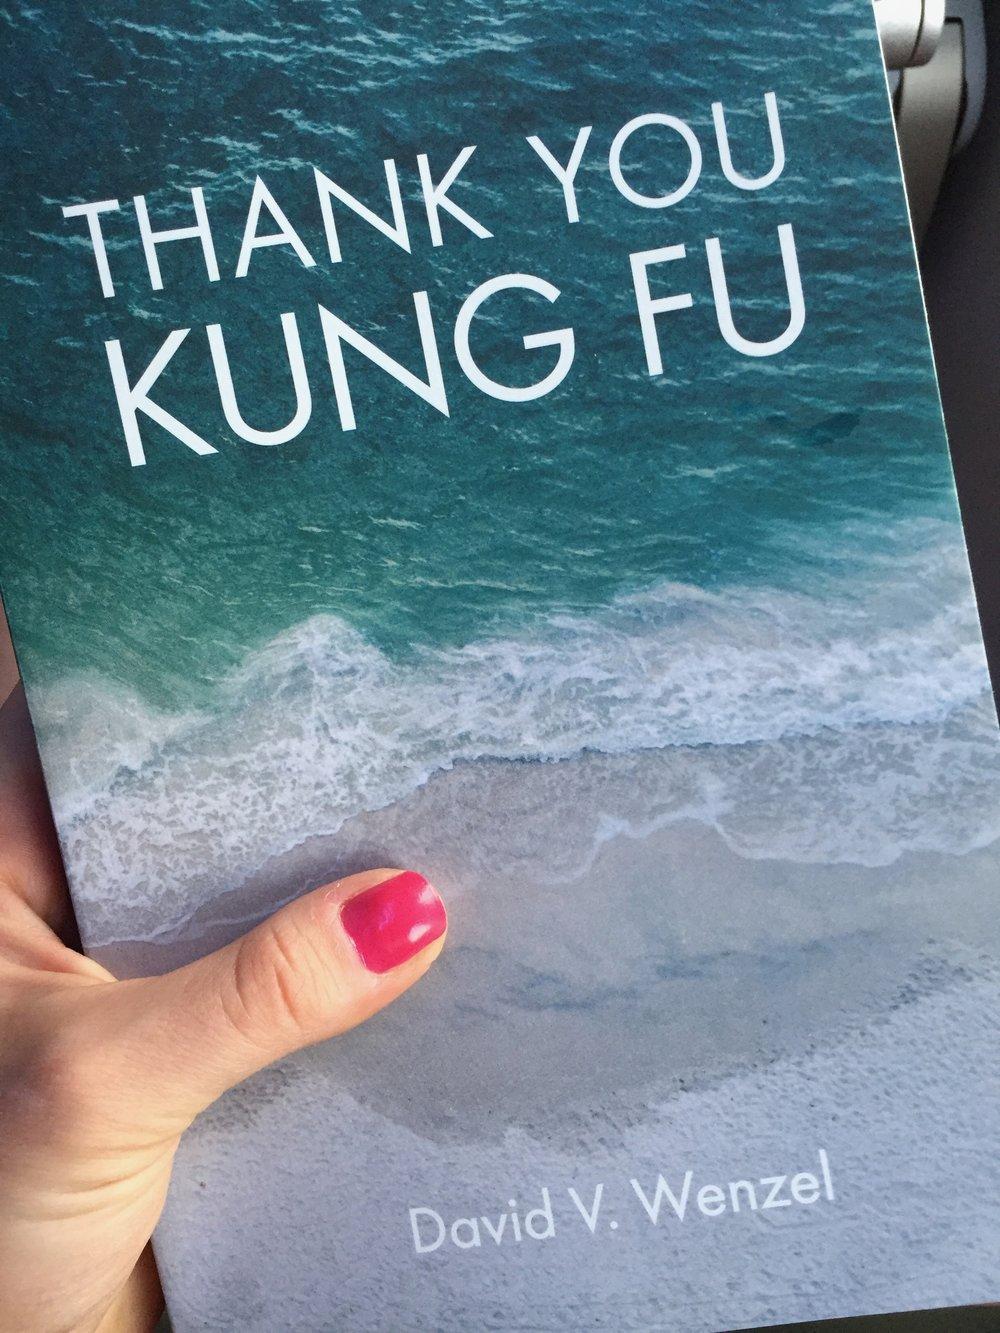 Thank You Kung Fu David Wenzel.jpg